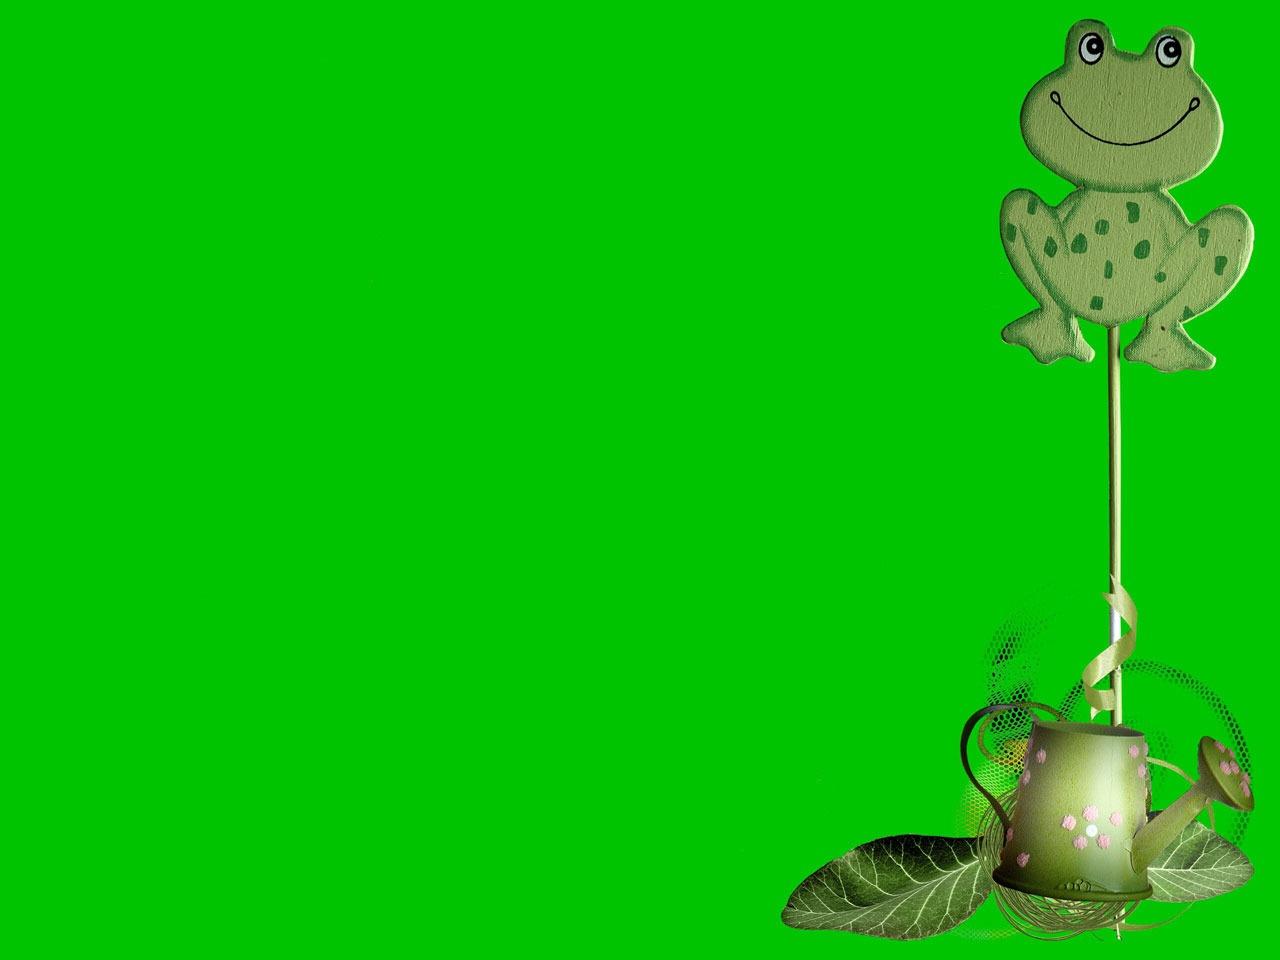 Gambar pot hijau katak amfibi taman ilustrasi hewan